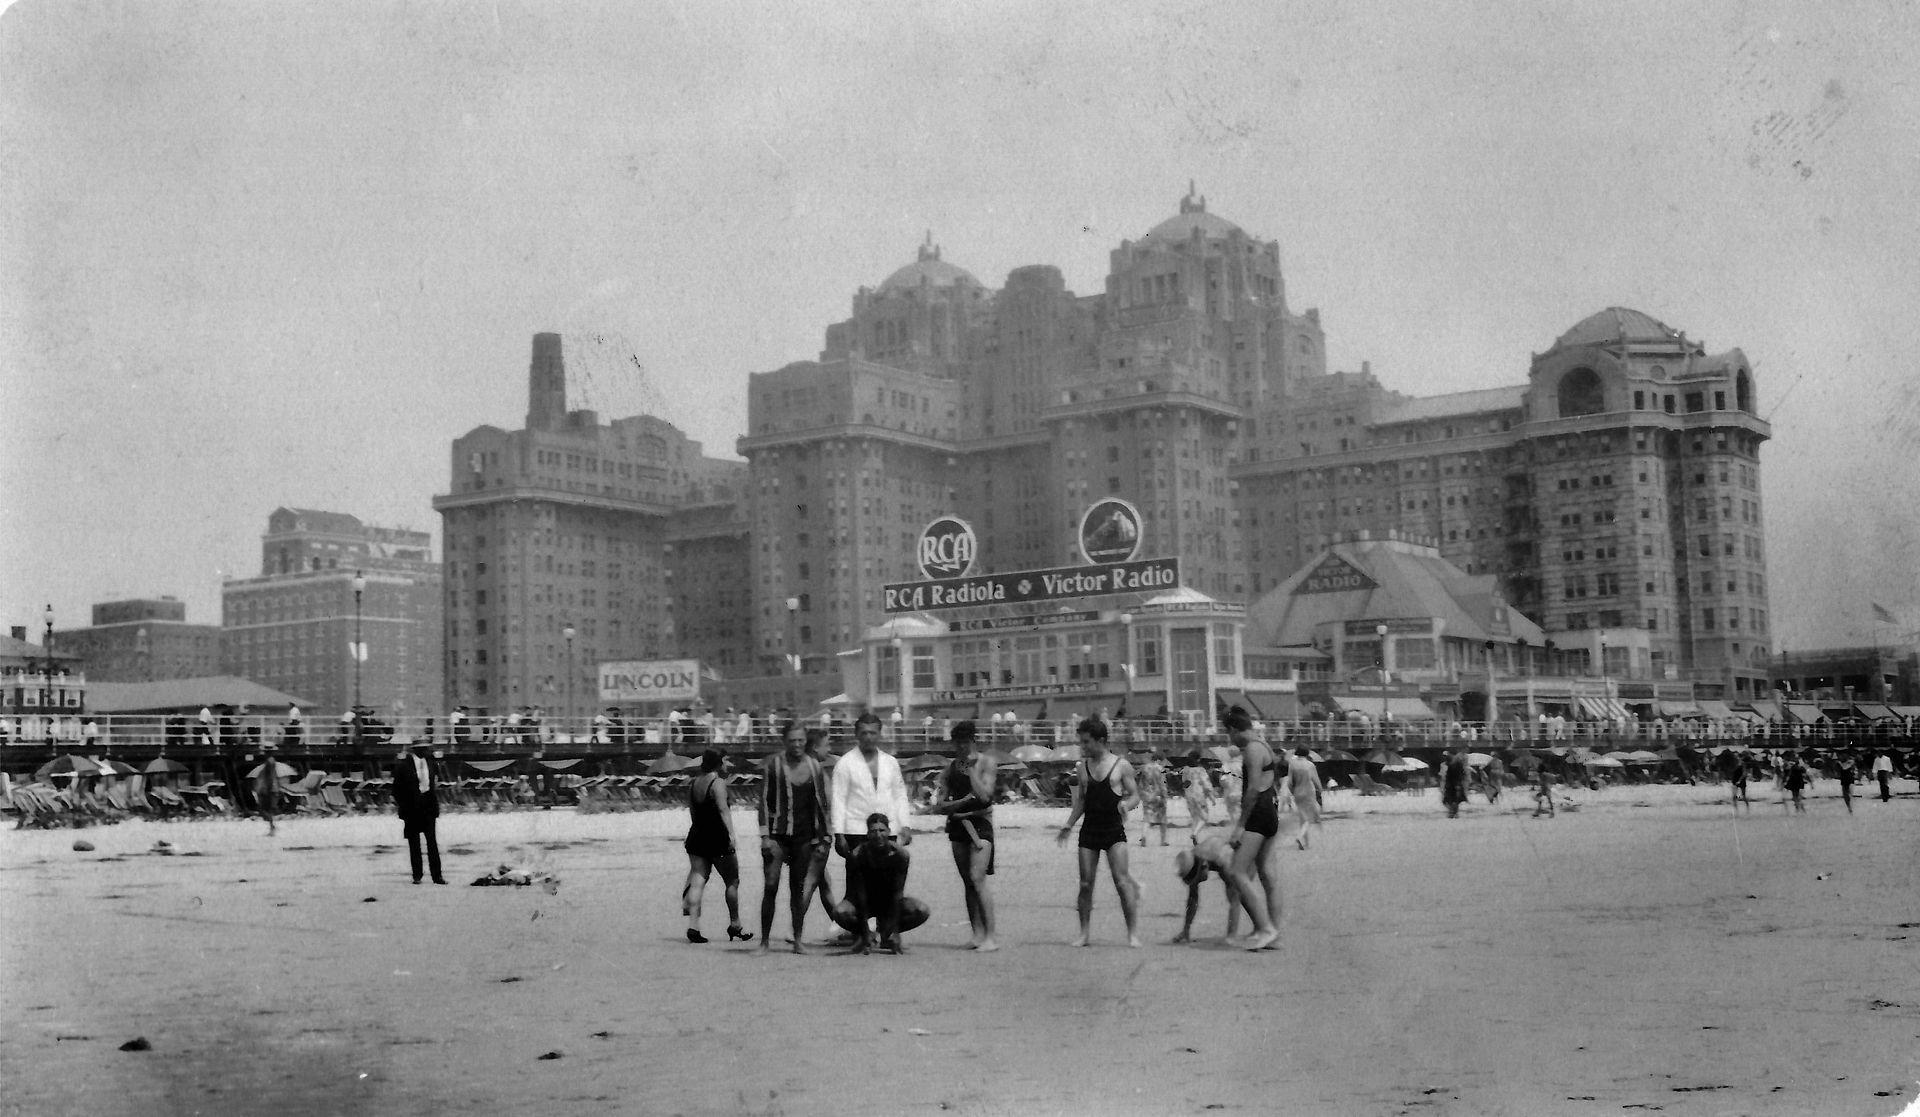 Atlantic City - Traymore Hotel - 1930